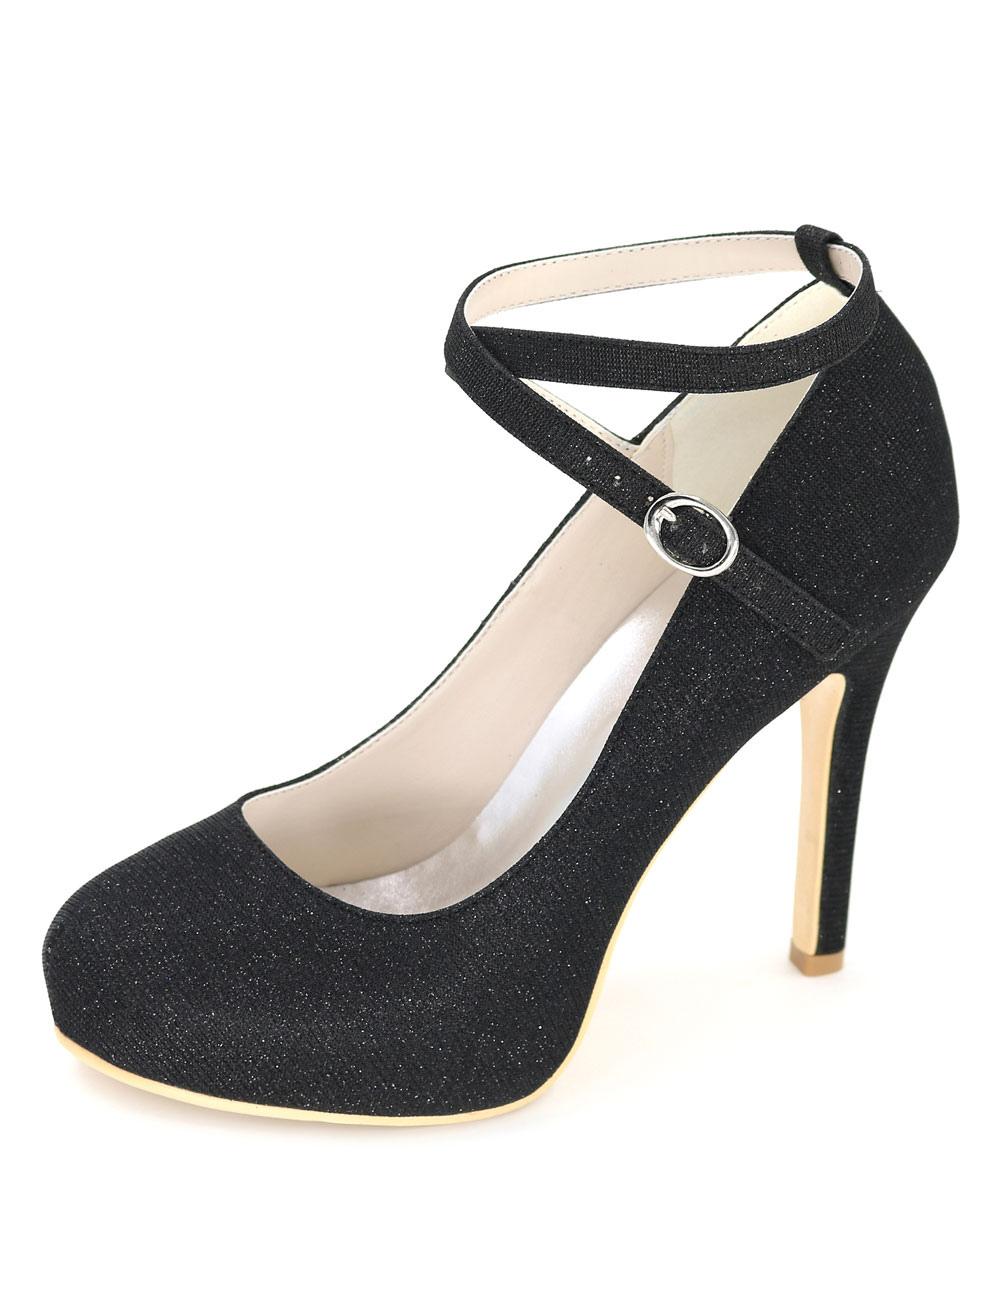 008c7a597c9 Black Wedding Shoes Platform High Heels Glitter Women s Ankle Strap Stiletto  Bridal Shoes-No. 12. 30%OFF. Color Black